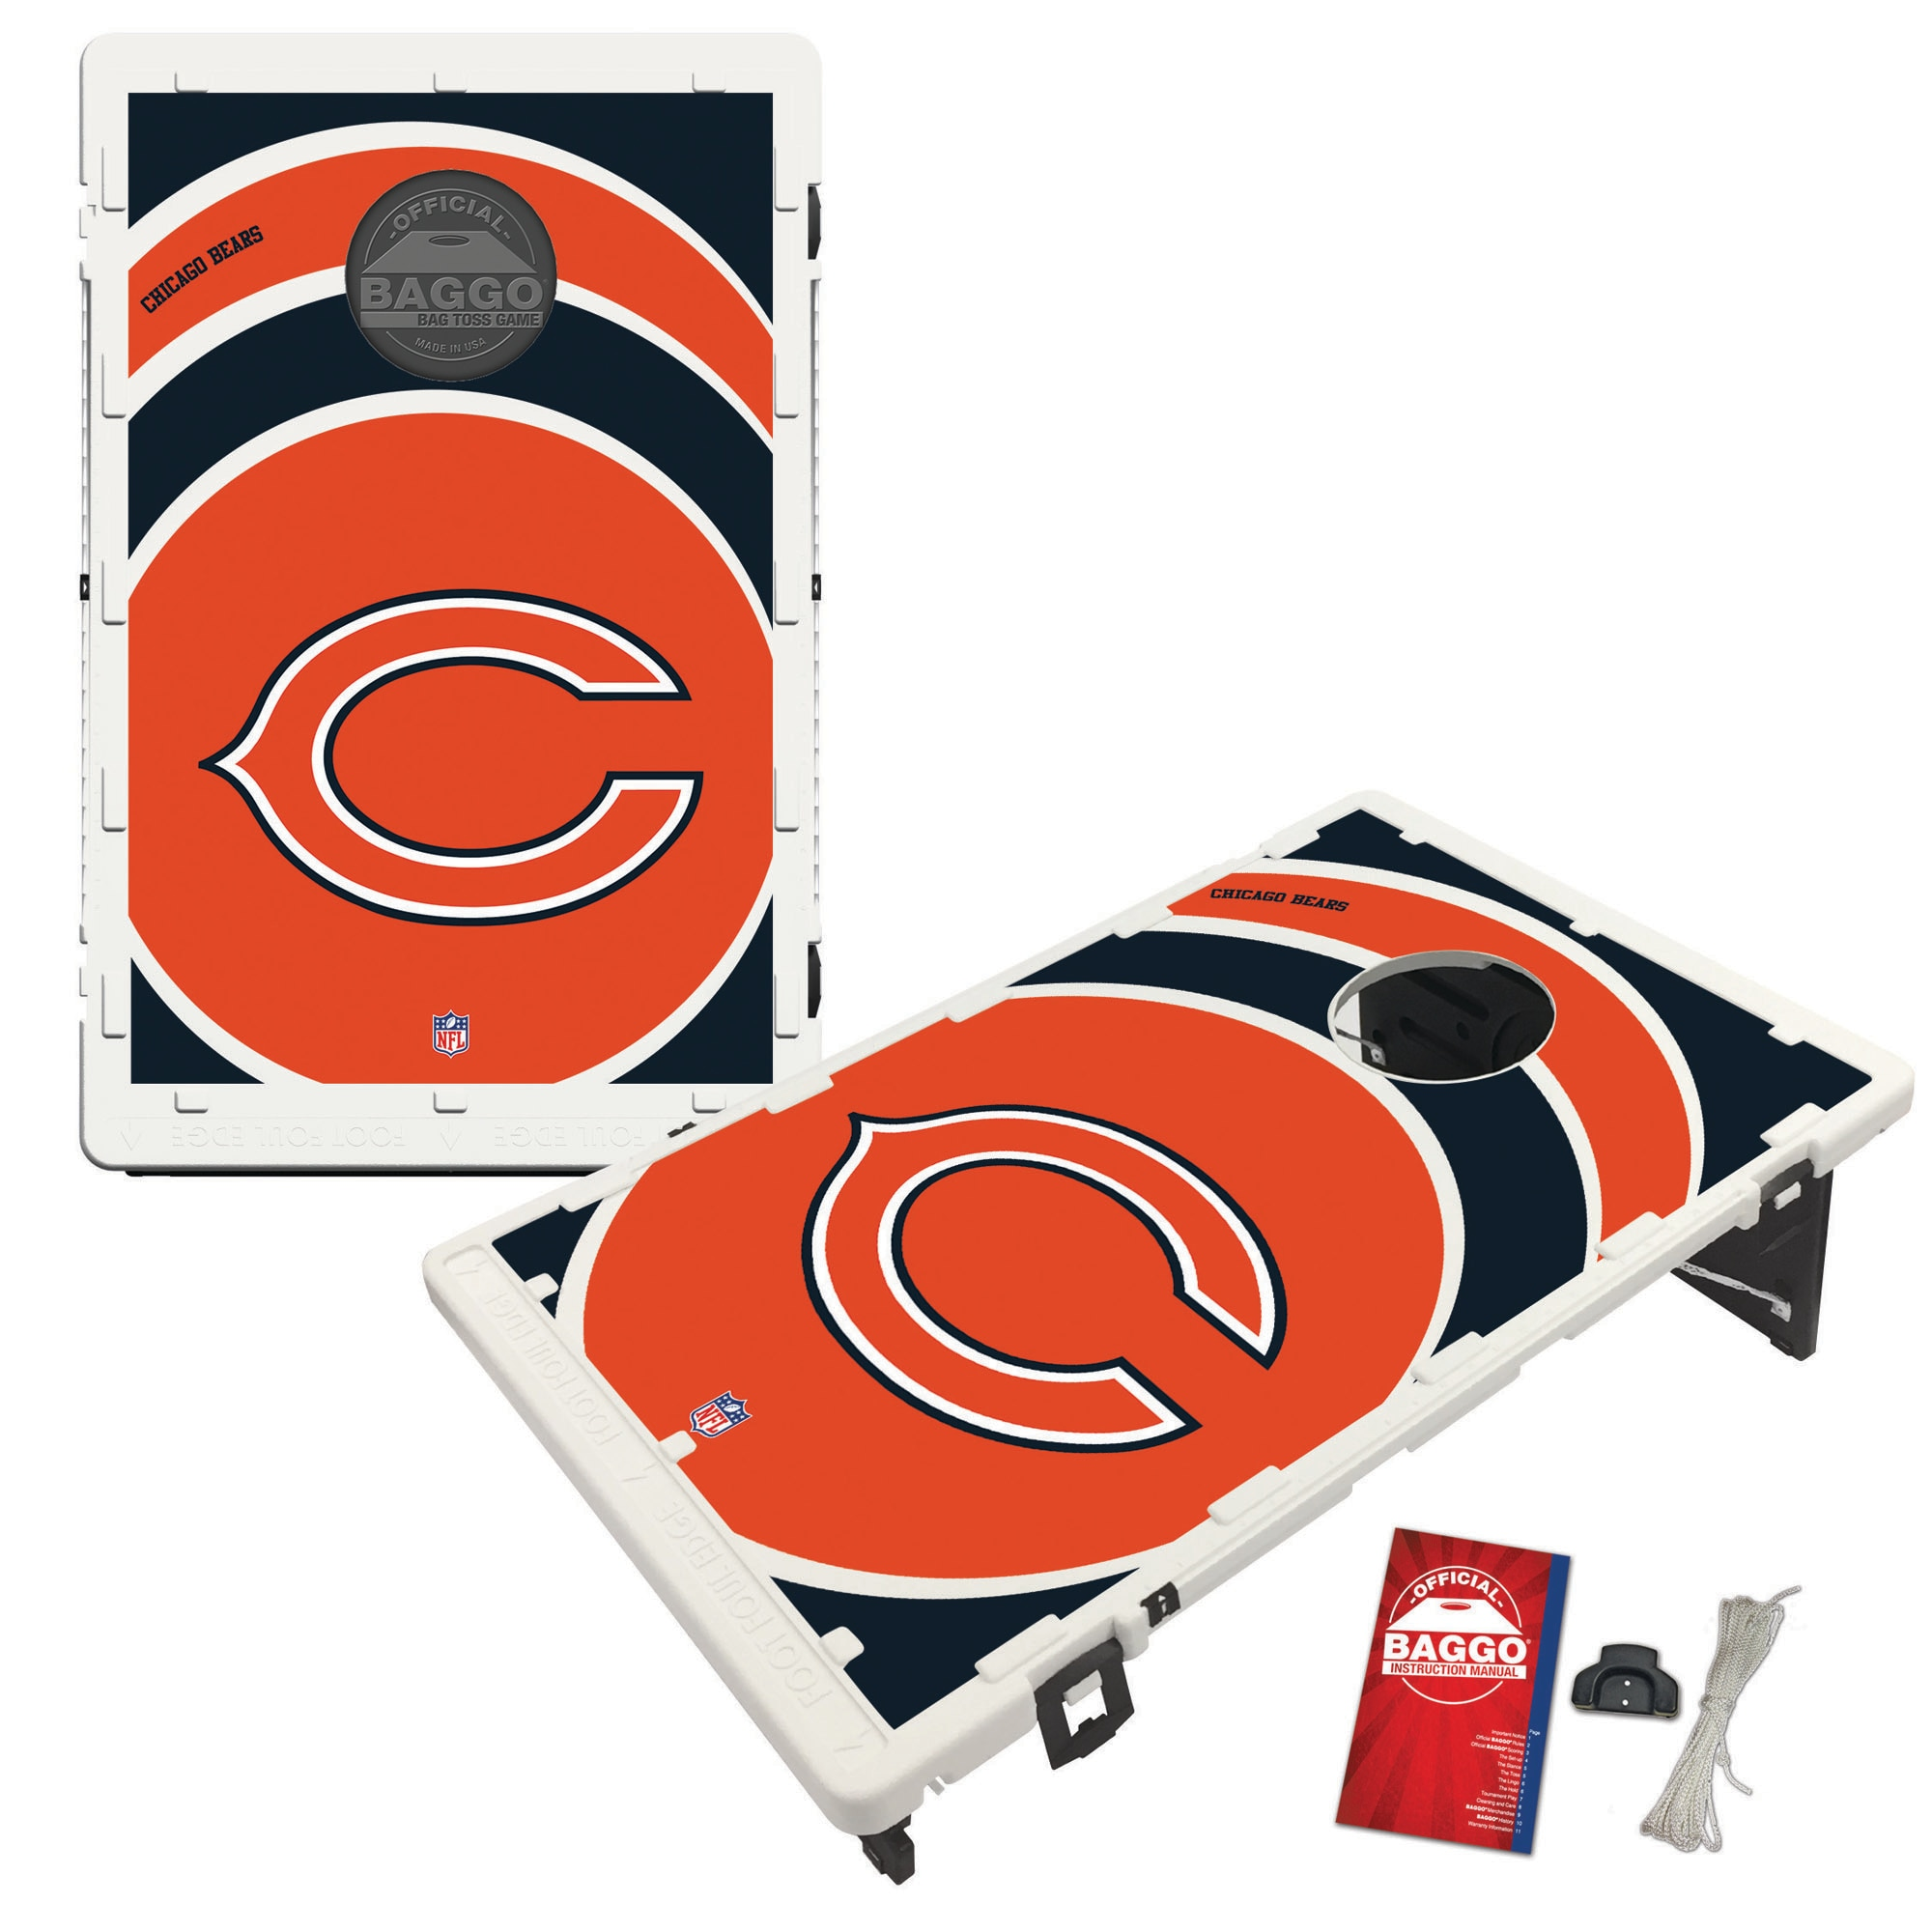 Chicago Bears 2' x 3' BAGGO Vortex Cornhole Board Tailgate Toss Set